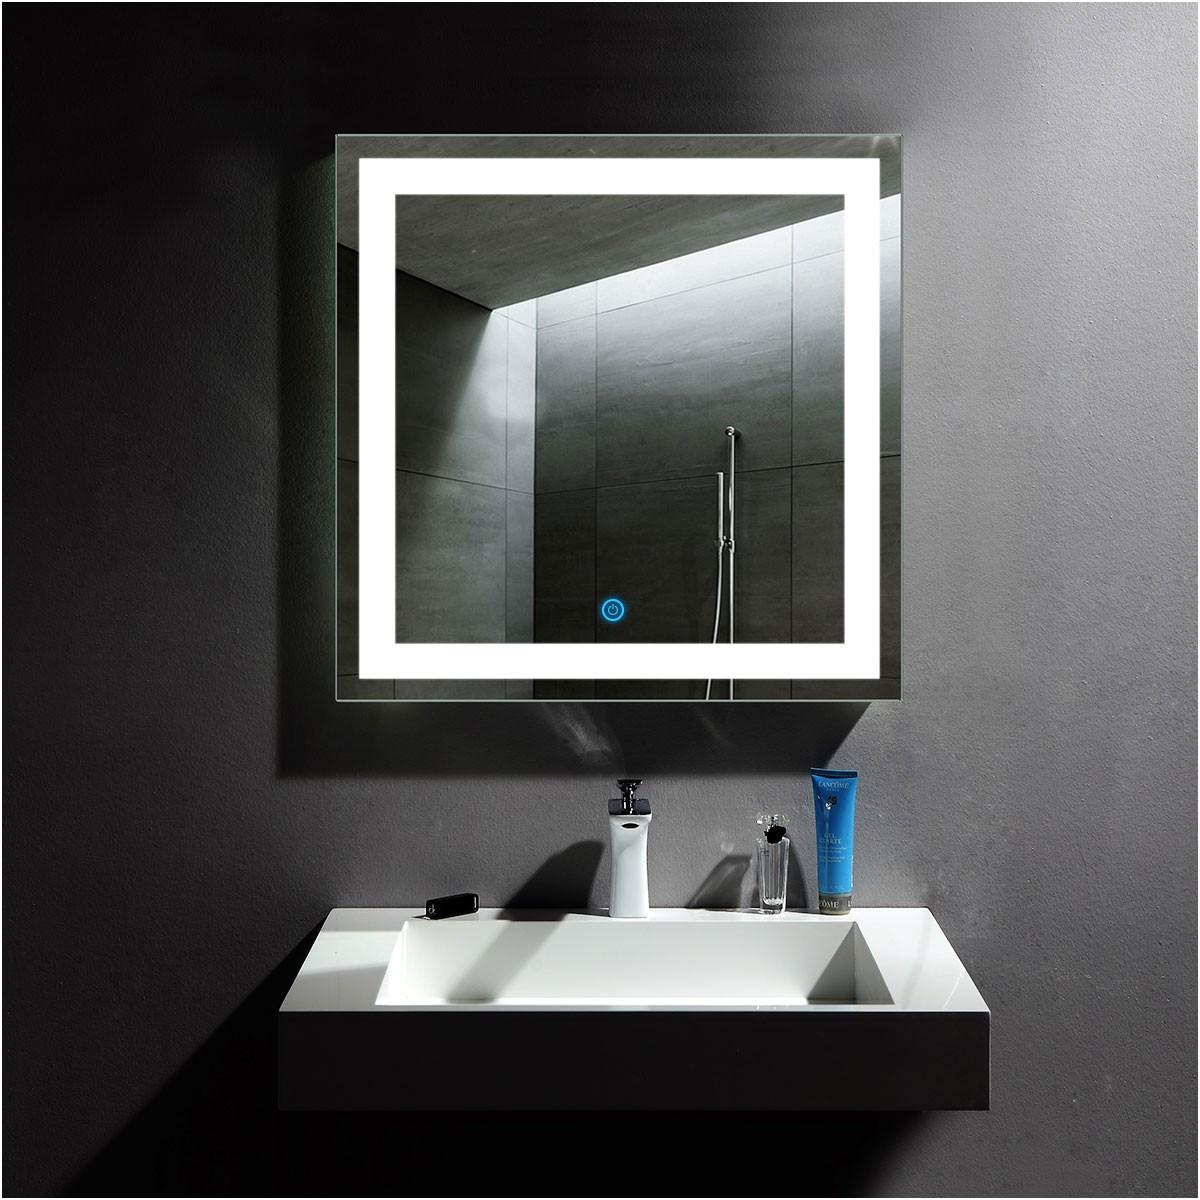 Luxury 2 Way Mirror In Bathroom